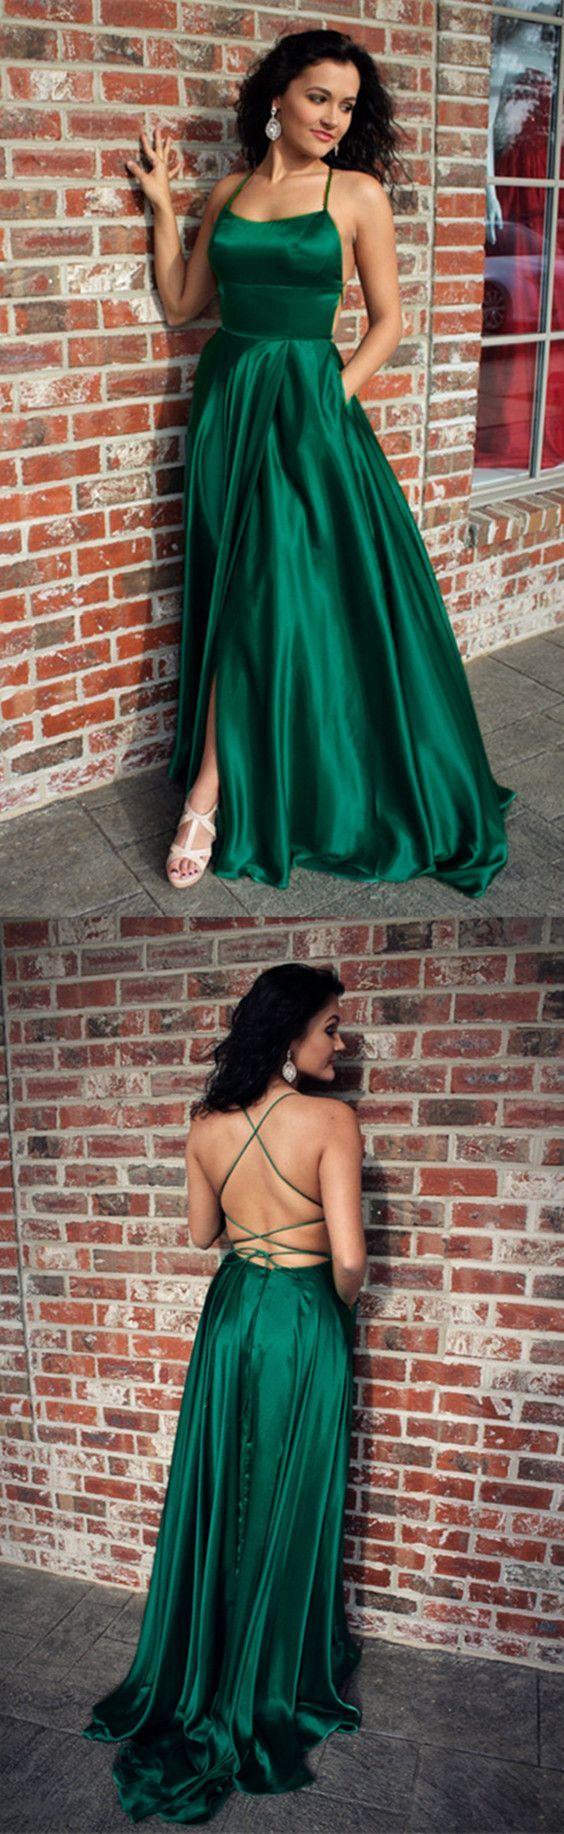 Dark Green Bridesmaid Dresses,Long Prom Dresses,Emerald Green Prom Dresses,Dark Green Evening Gowns #longpromdresses